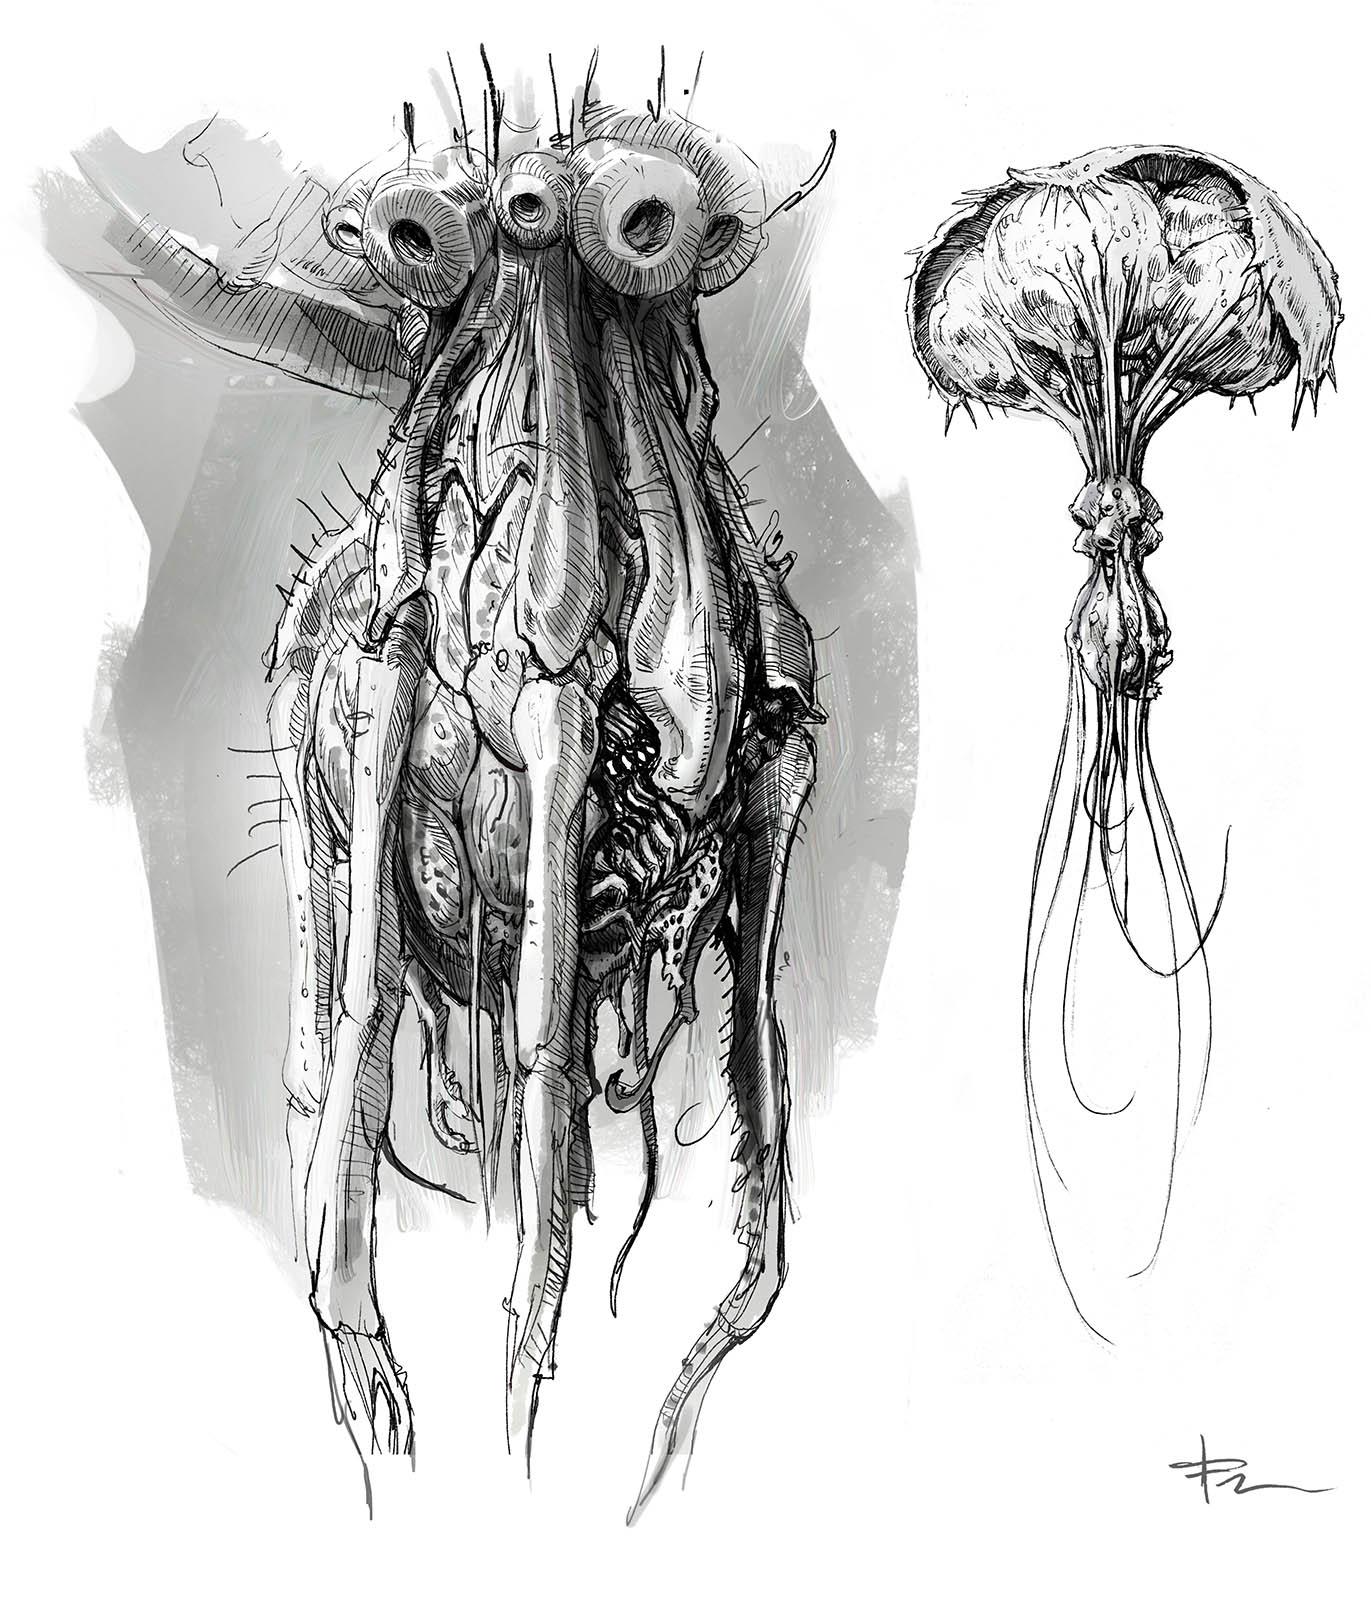 TJFRame-Art_CanceledProj_Jellyfish.jpg